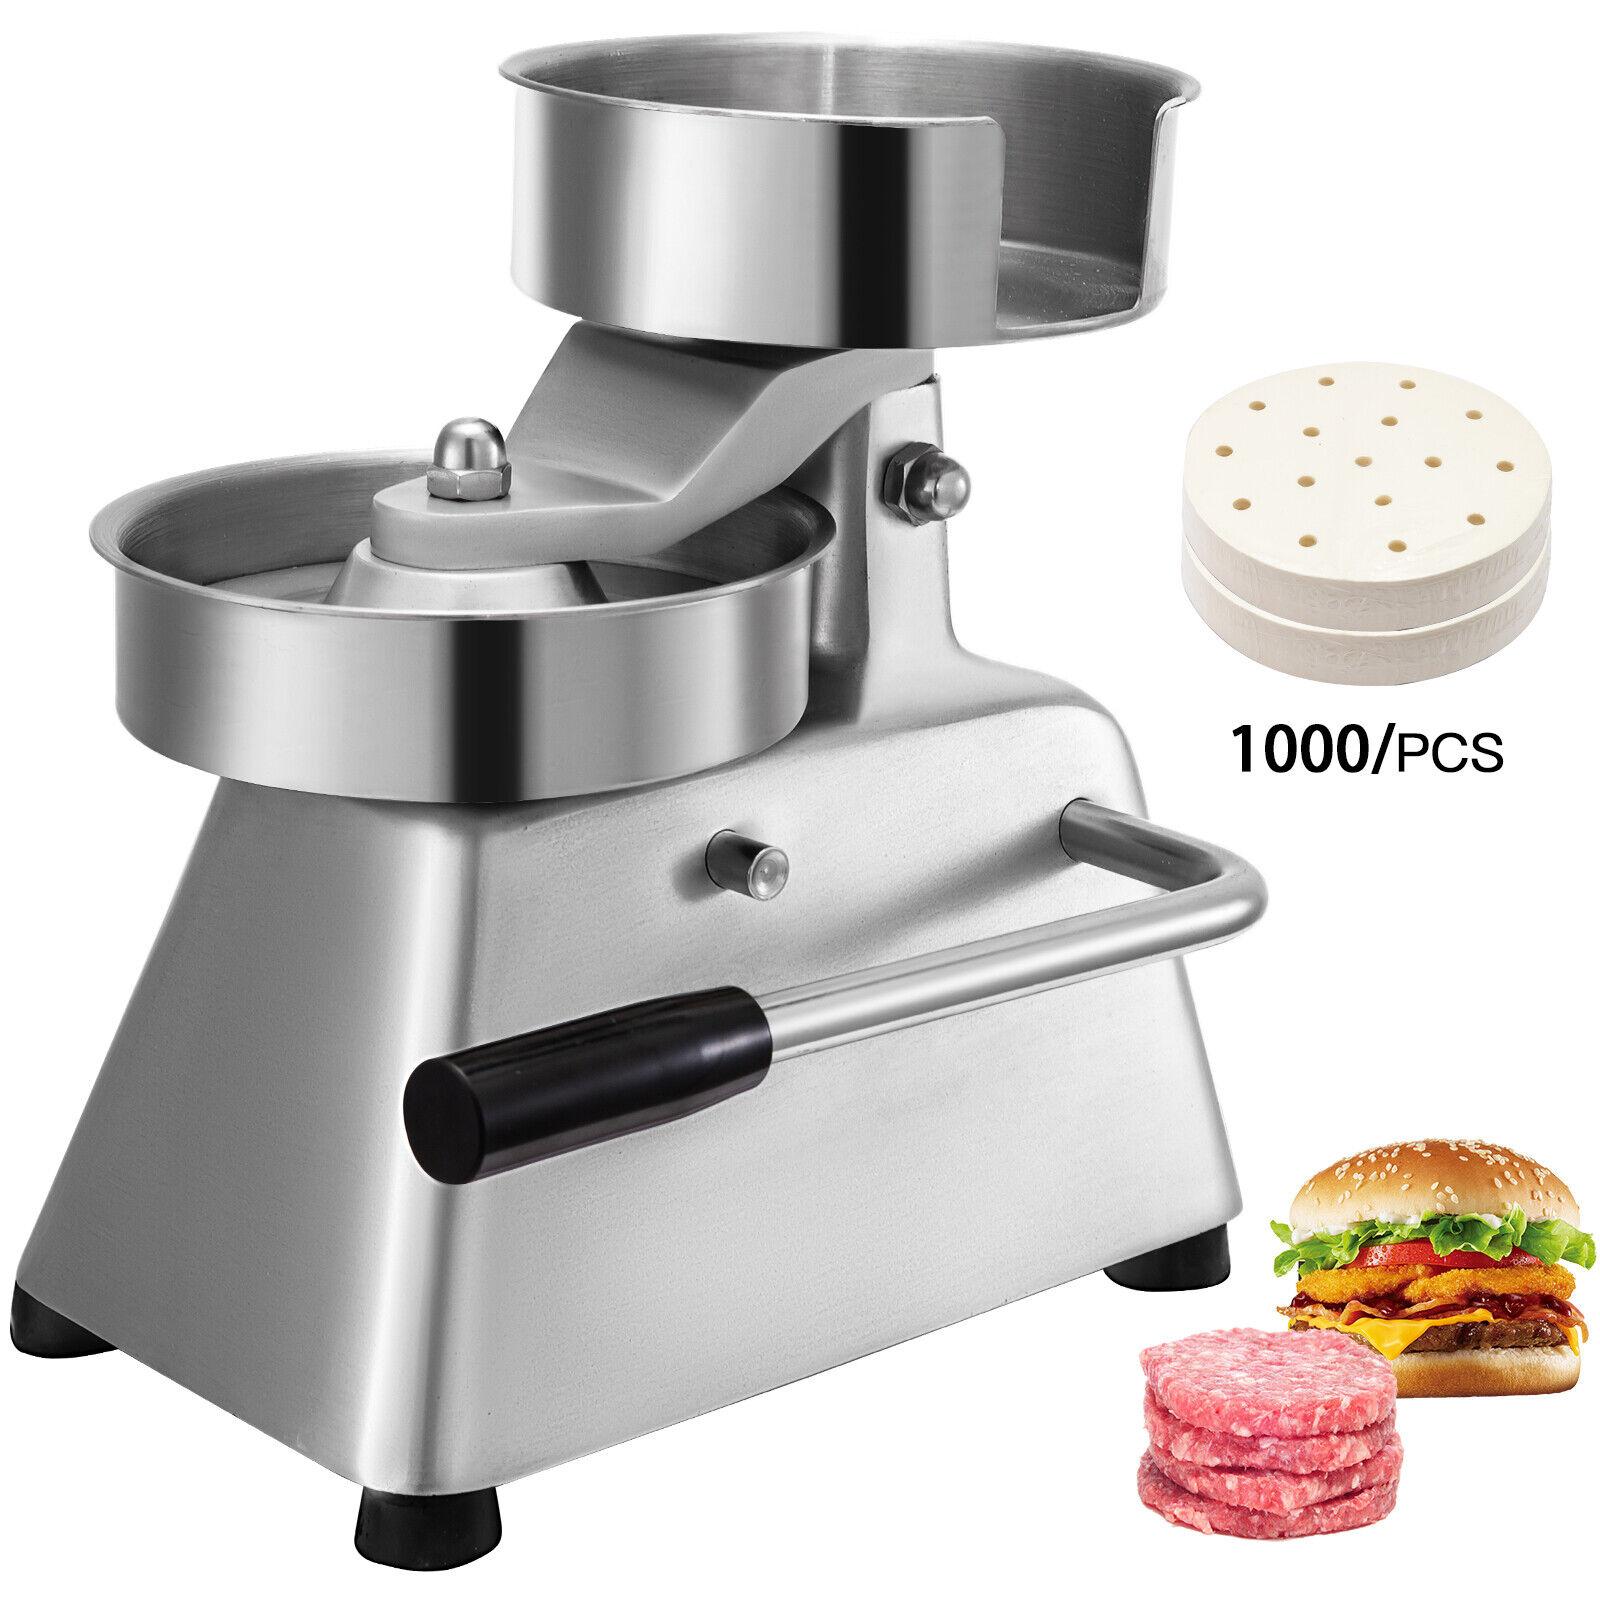 VEVOR Maquina para hamburguesa profesional prensa prensadora 1000 papel 100mm